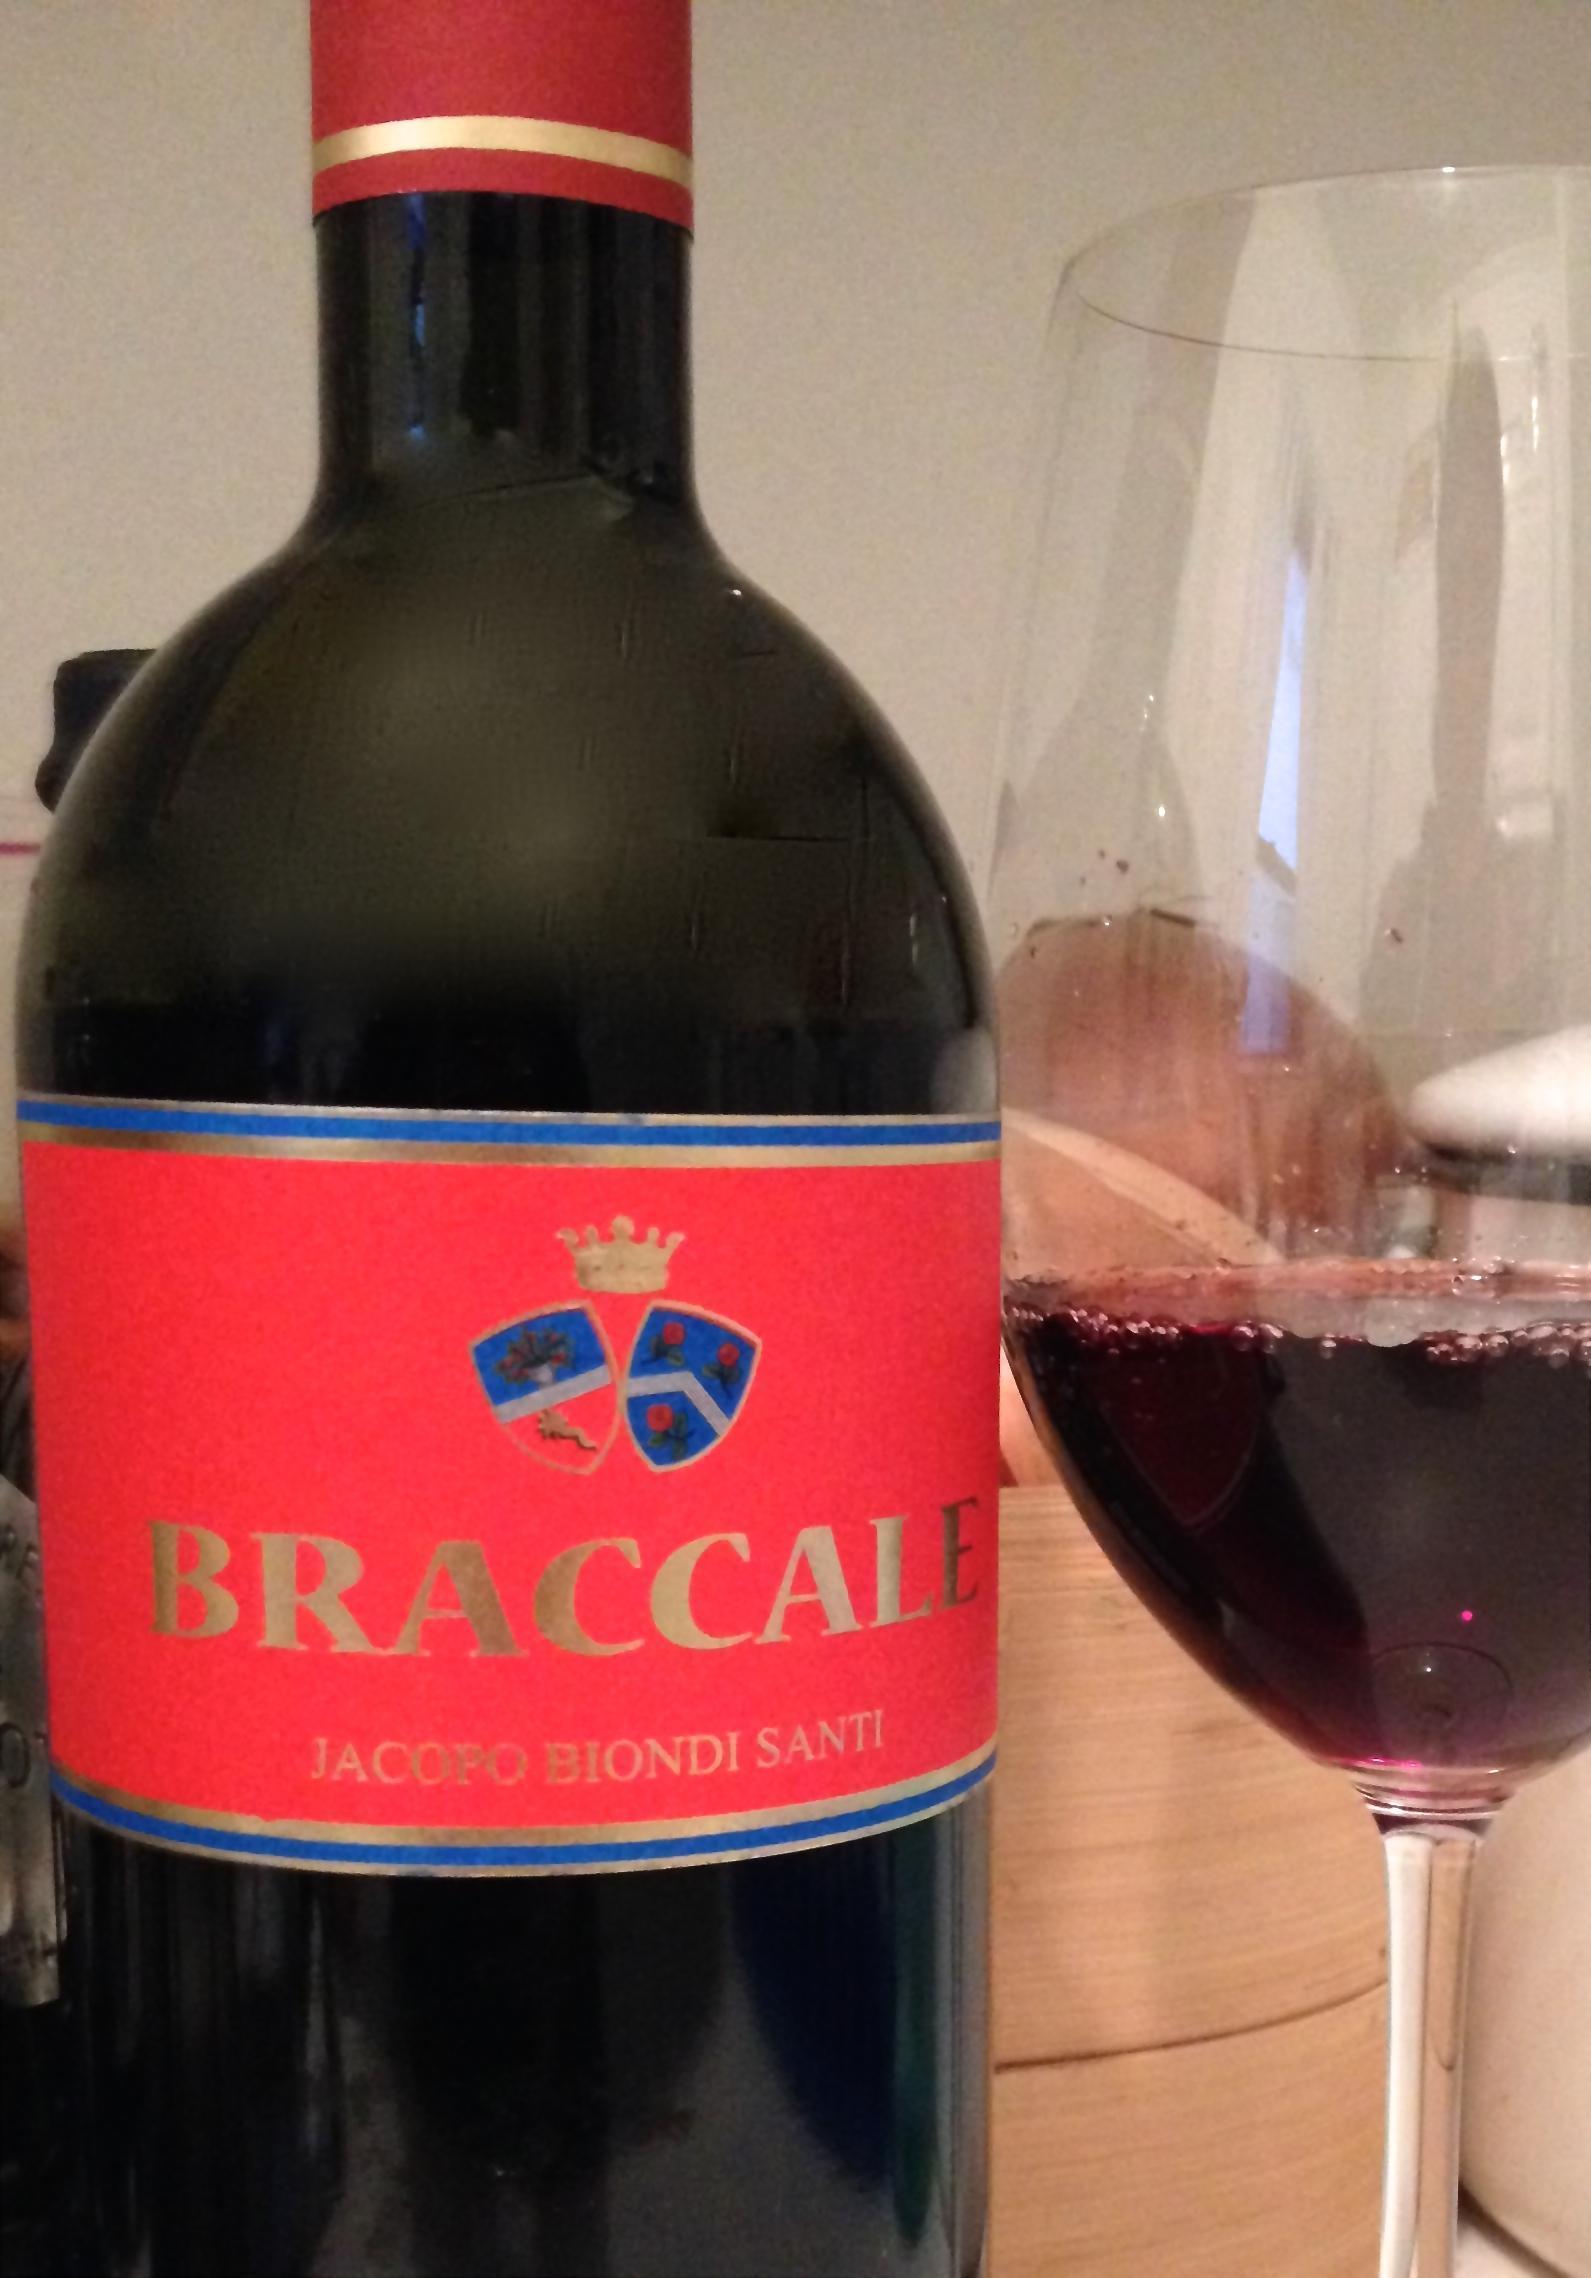 2011 Jacopo Biondi Santi Braccale Rosso 2